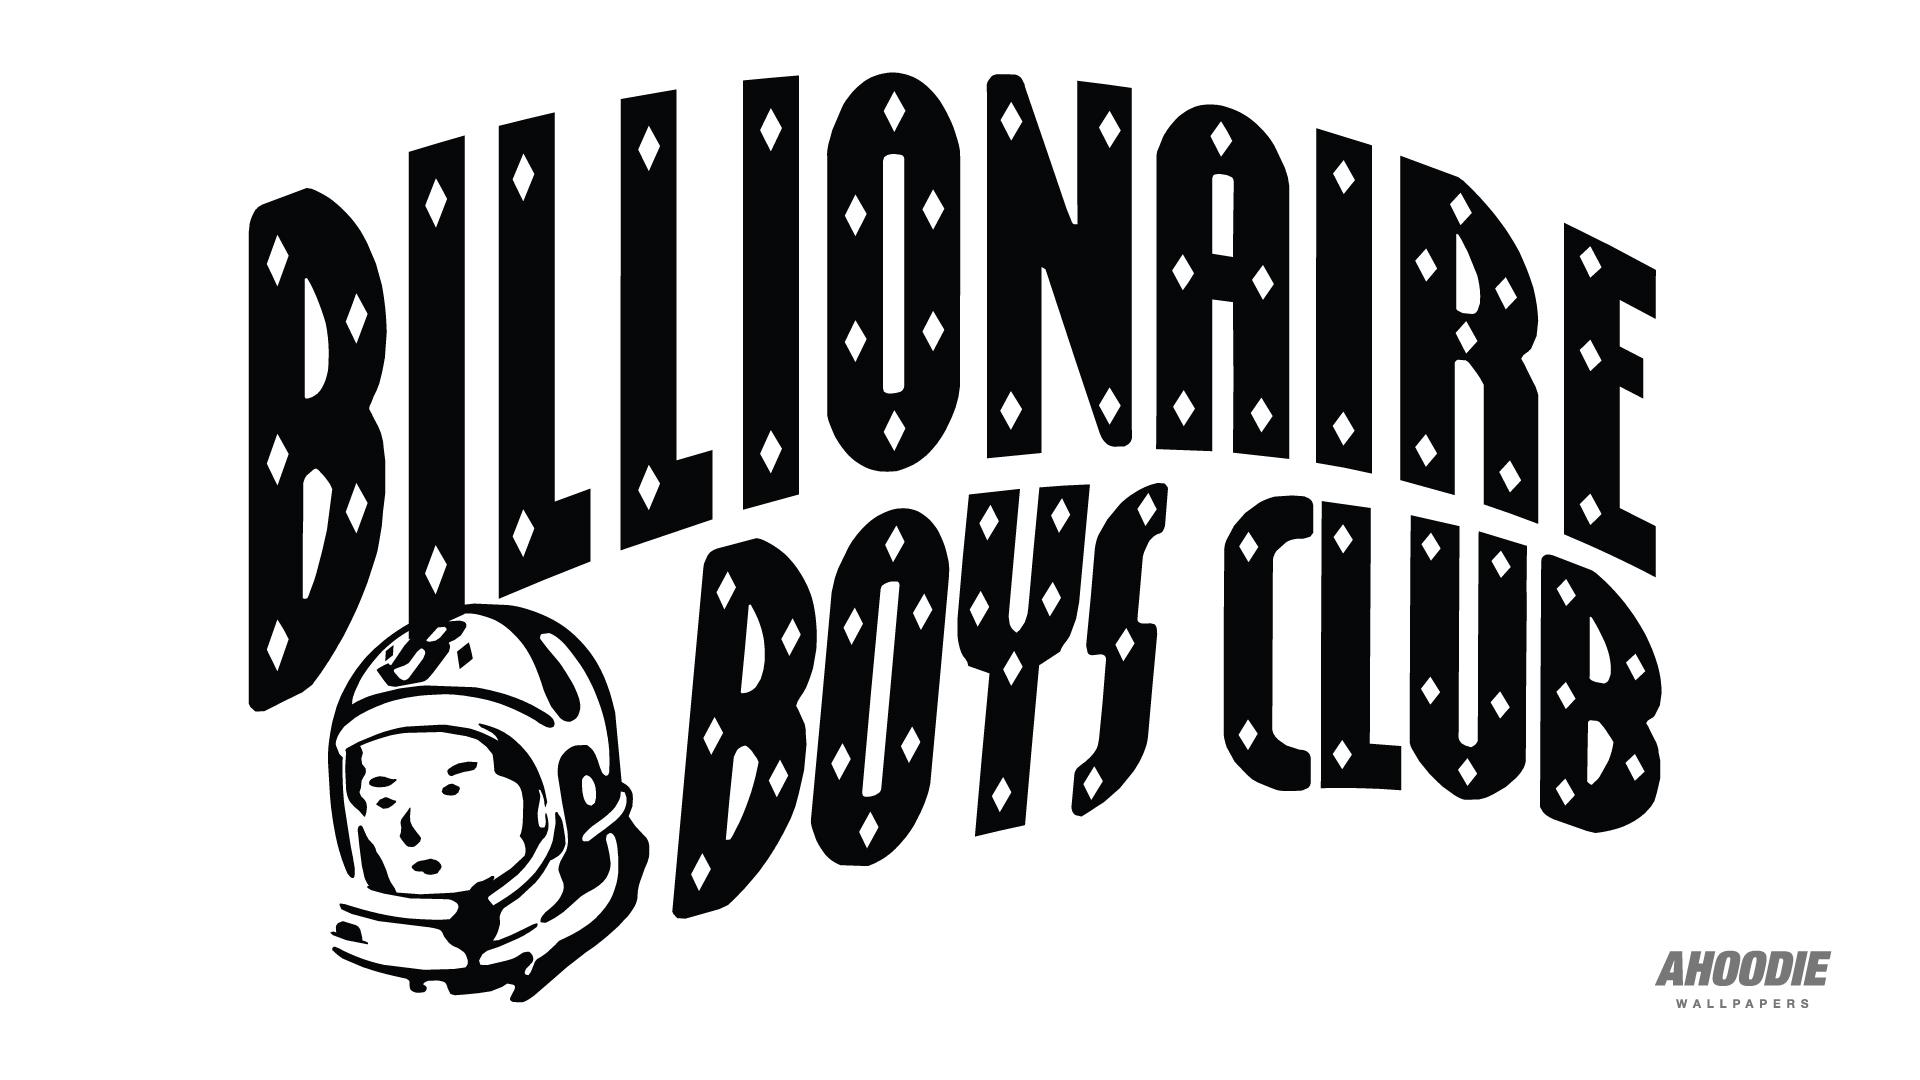 A1nyc billionaire girls club scene 1 2